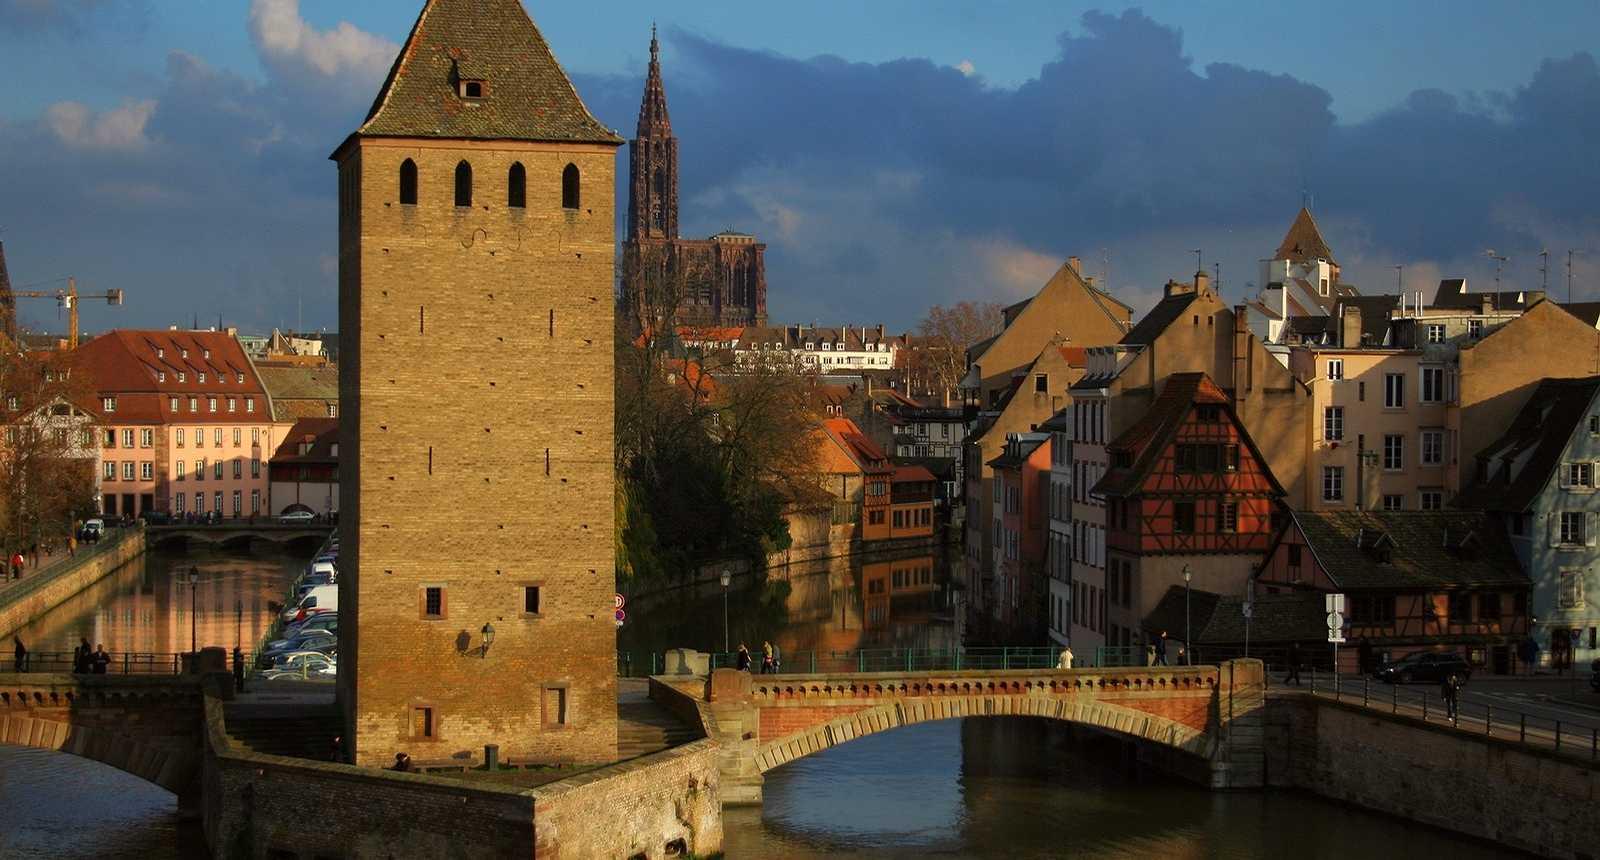 Office de tourisme de strasbourg strasbourg 67000 bas rhin 67 - Office tourisme marmoutier ...